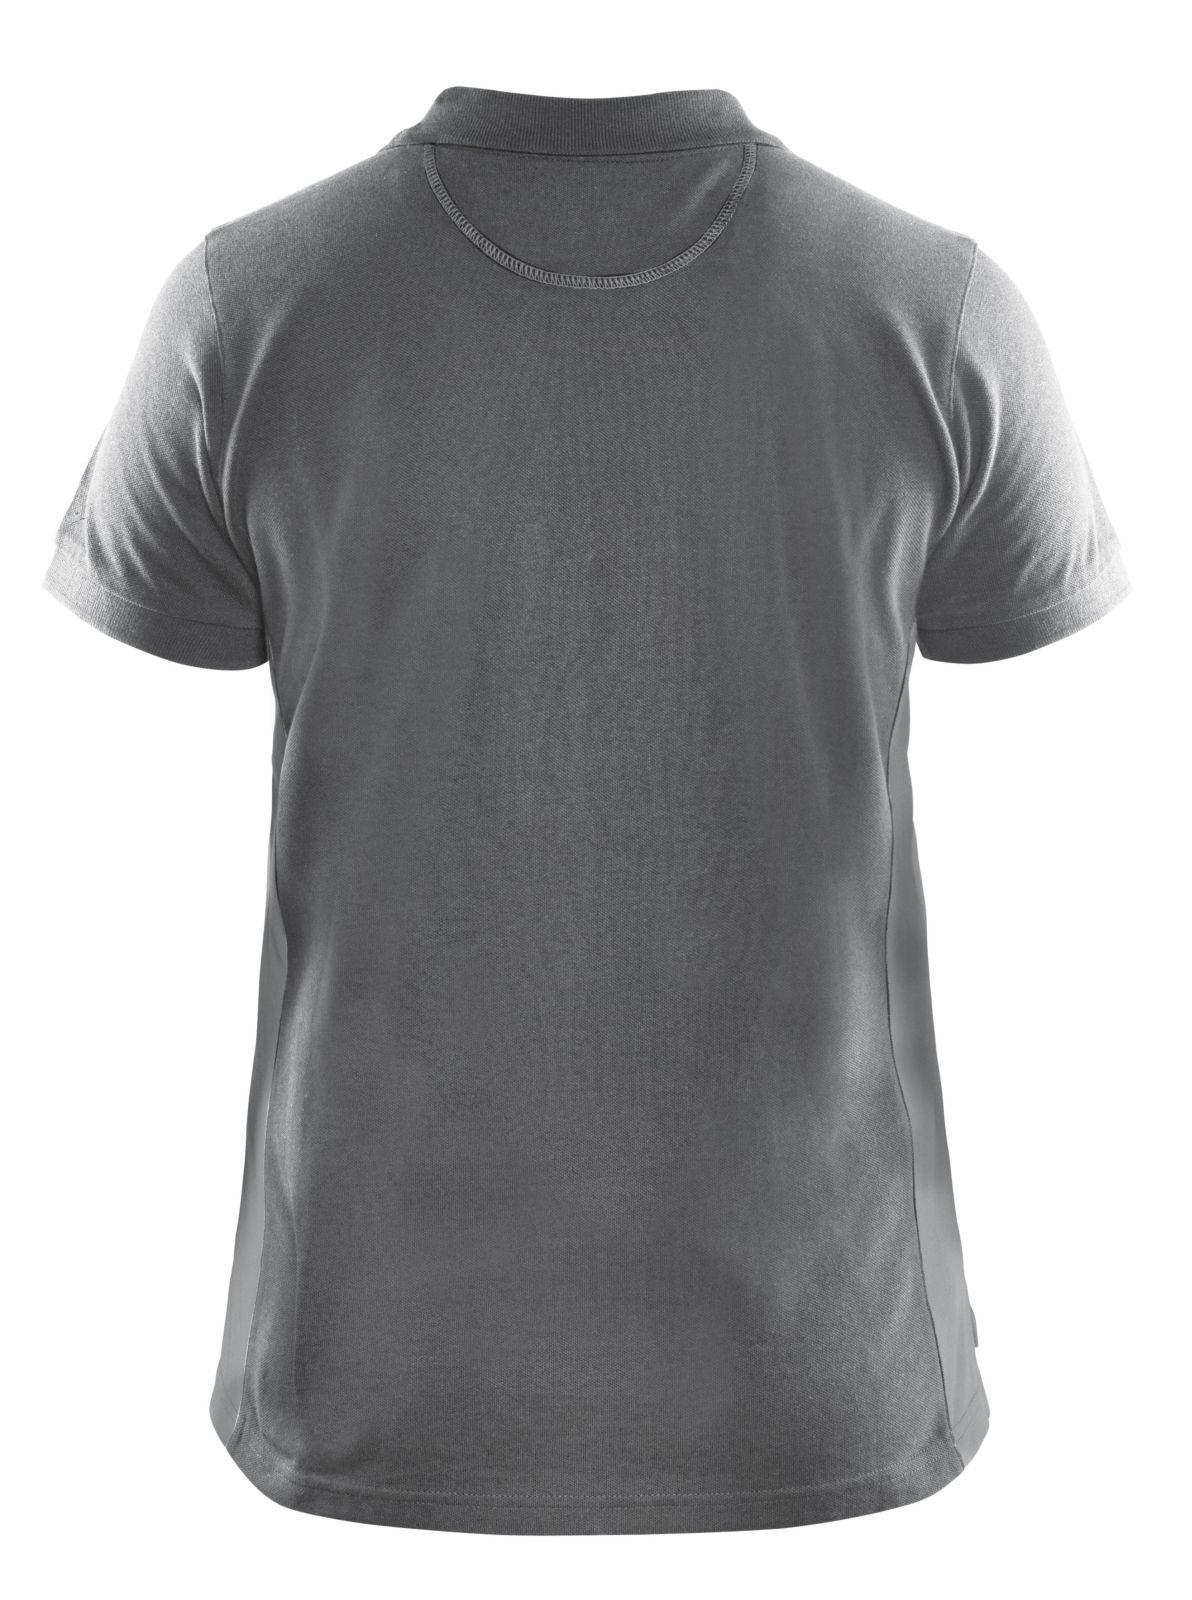 Blaklader Dames polo shirts 33901050 grijs(9400)